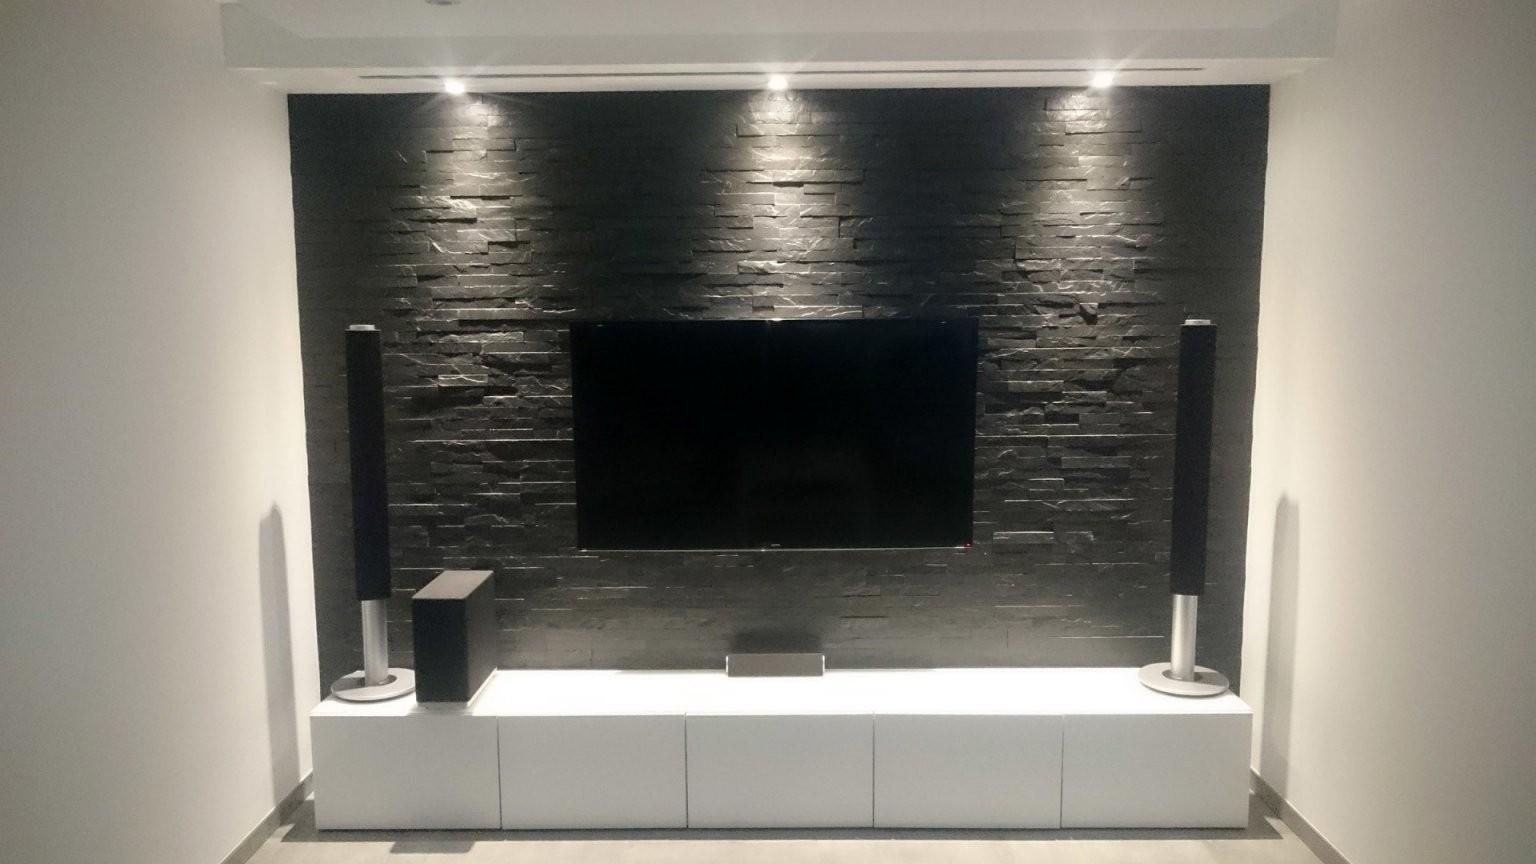 Tv An Wand Kabel Verstecken Prime –· Multimedia Wohnzimmer Mit von Tv An Wand Kabel Verstecken Bild